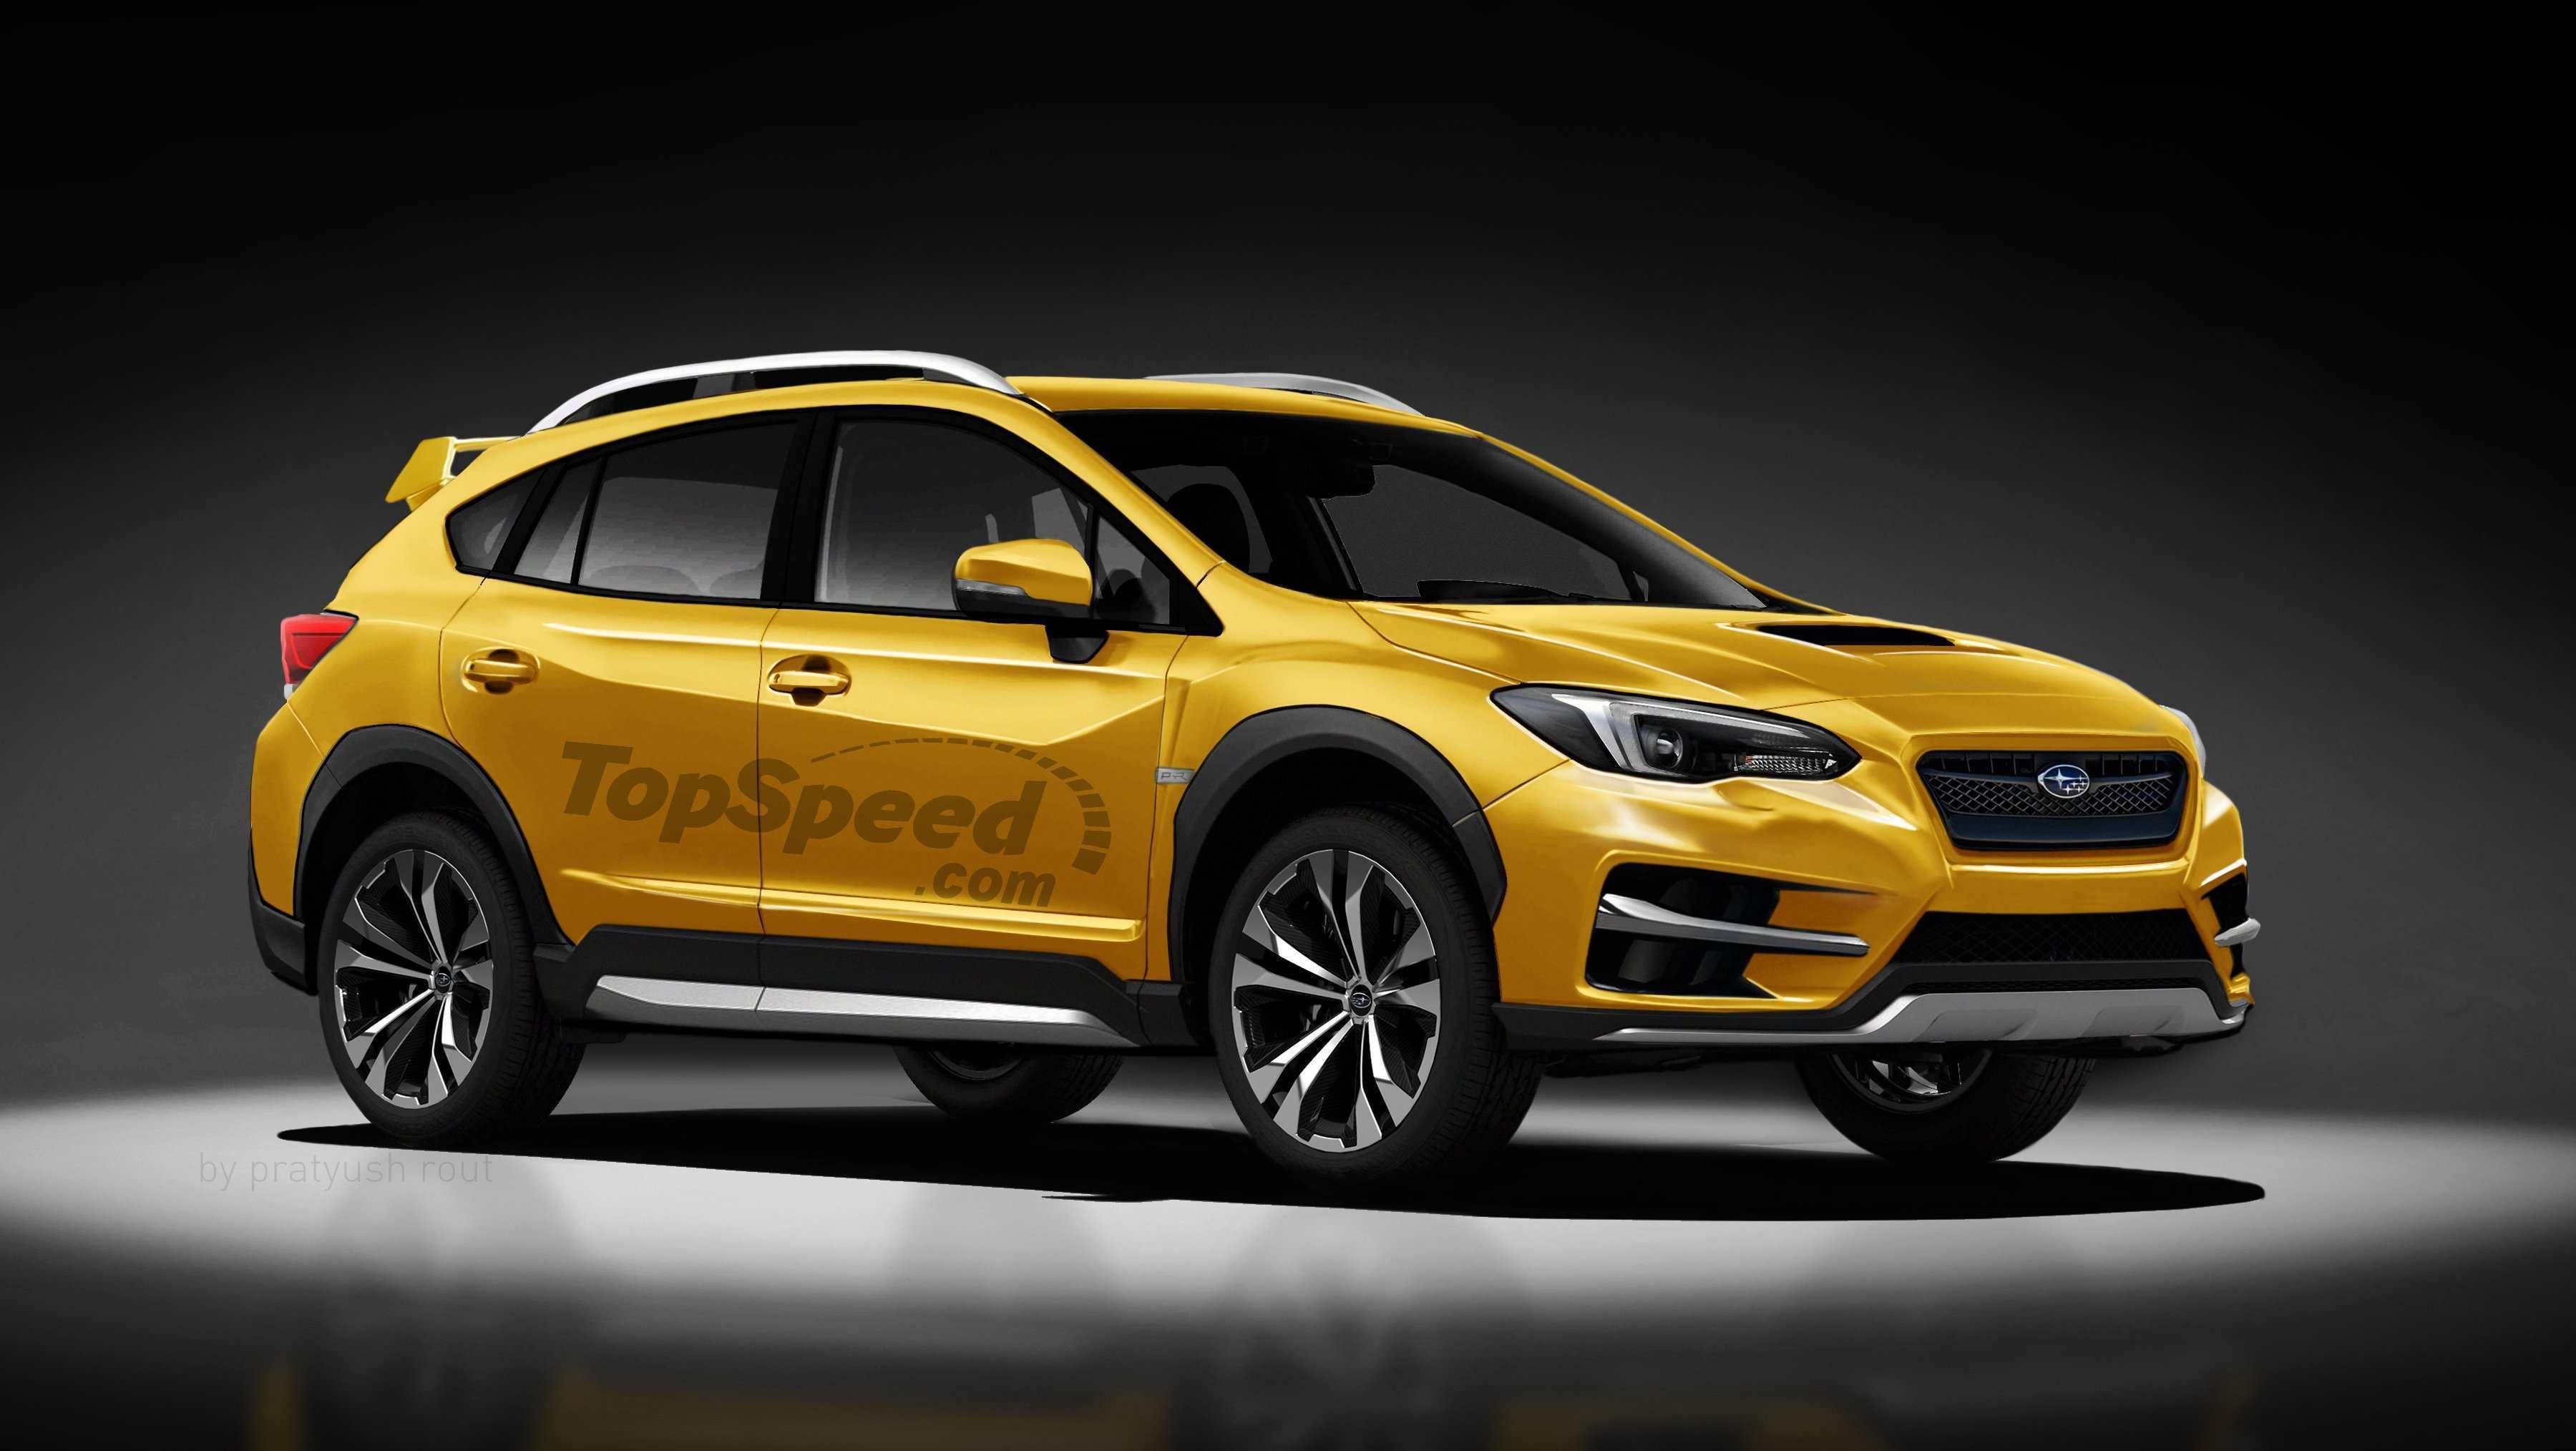 40 Gallery of Subaru 2020 Vehicles Specs for Subaru 2020 Vehicles